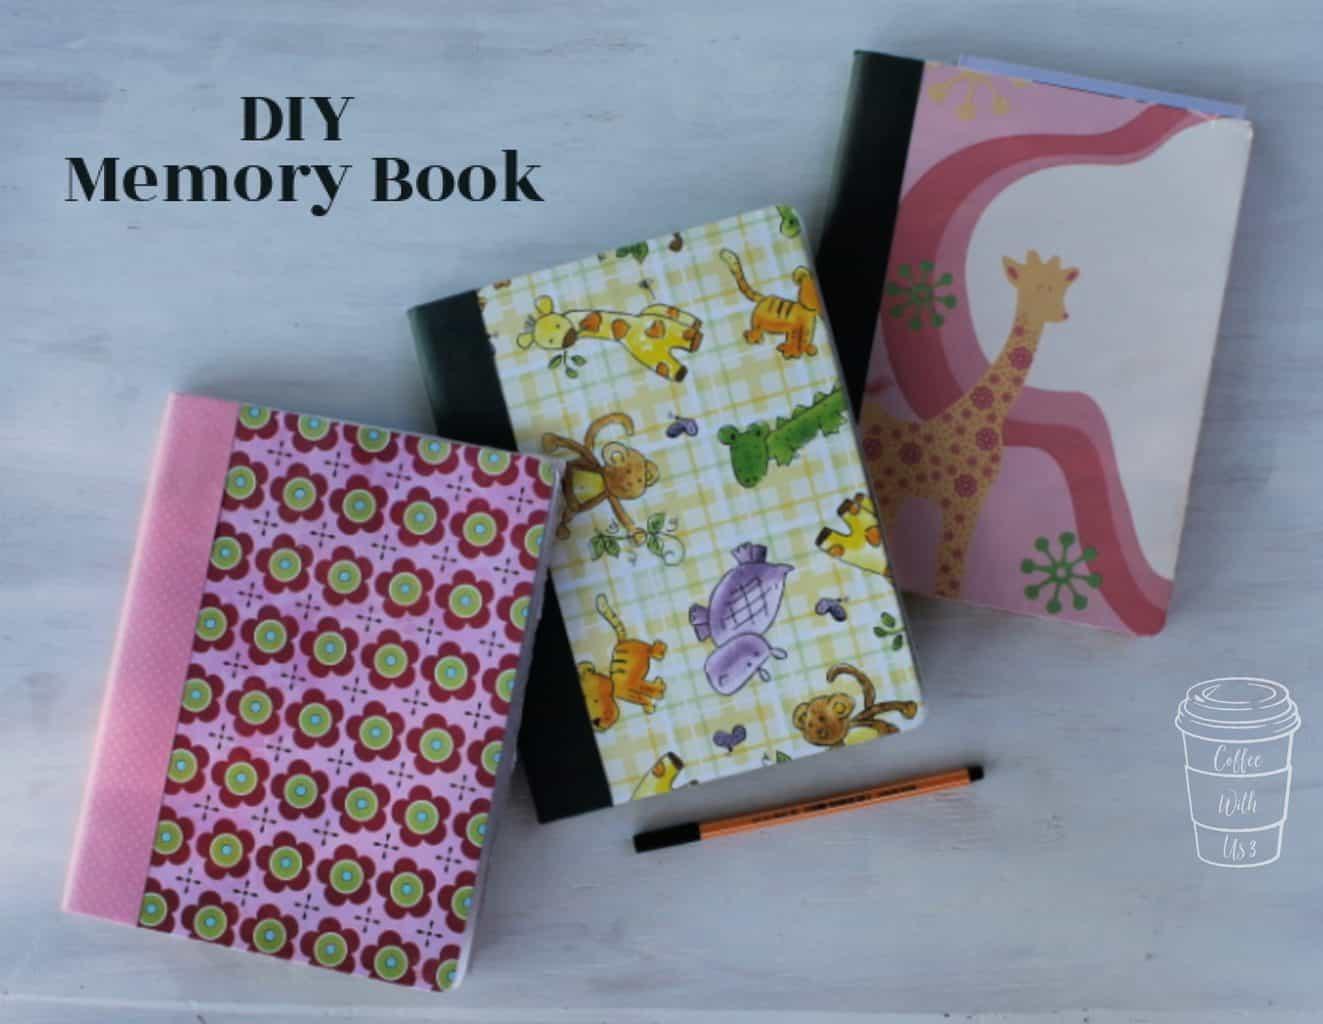 A stack of 3 DIY Memory Book keepsakes